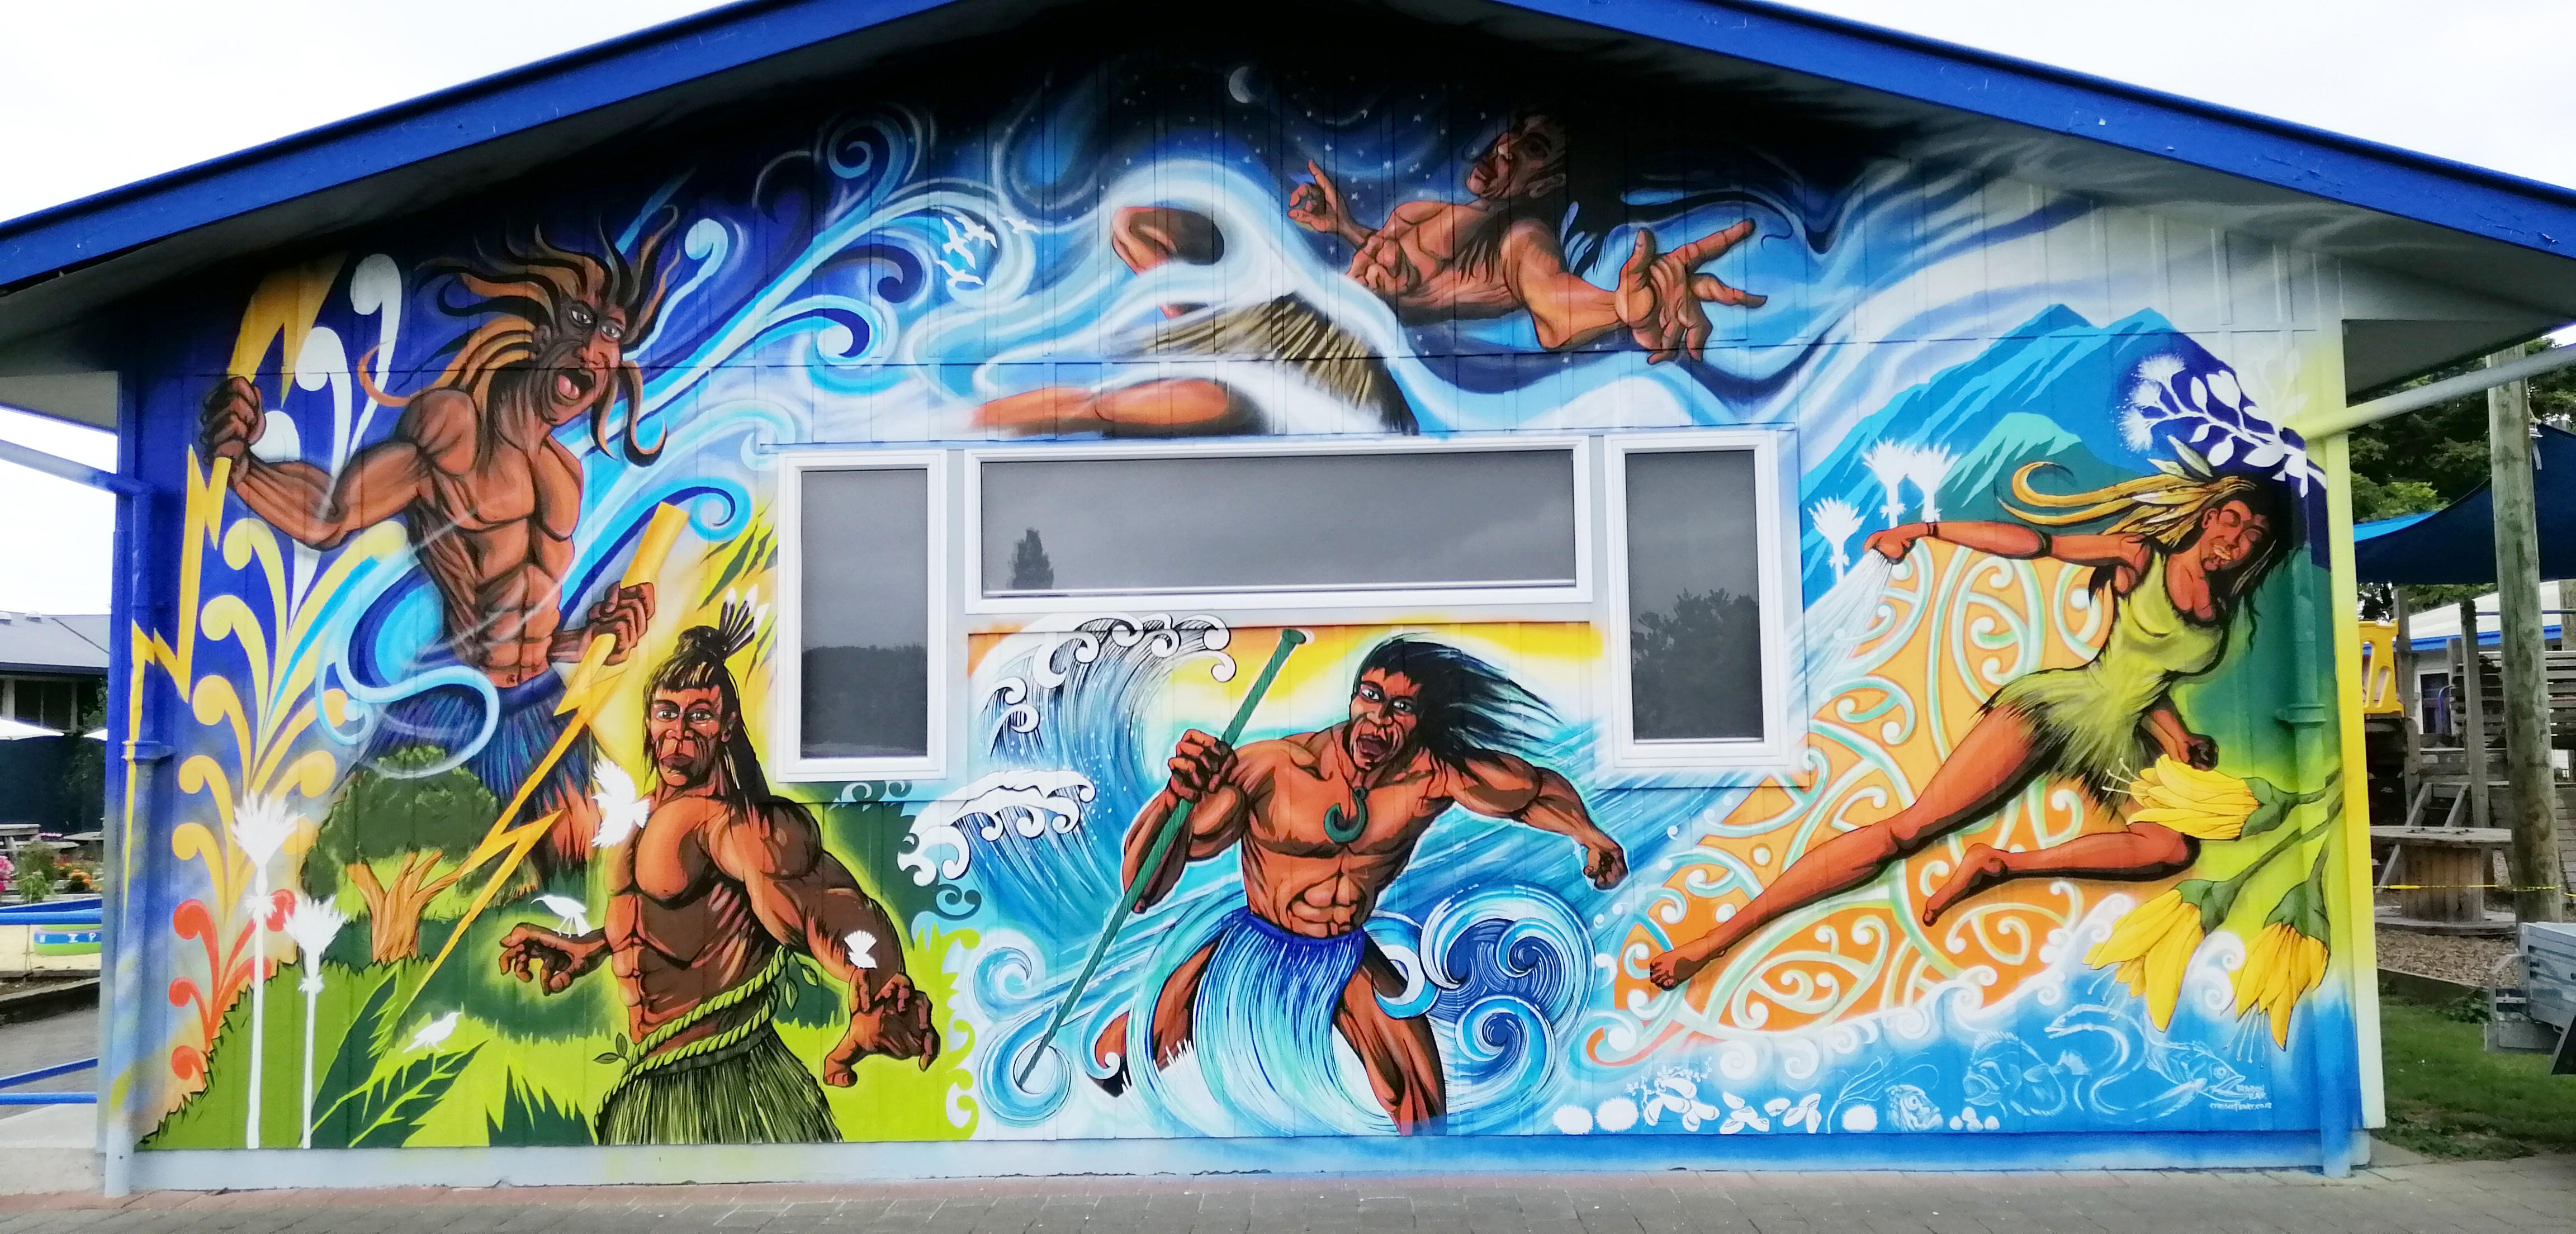 maori gods mural finished